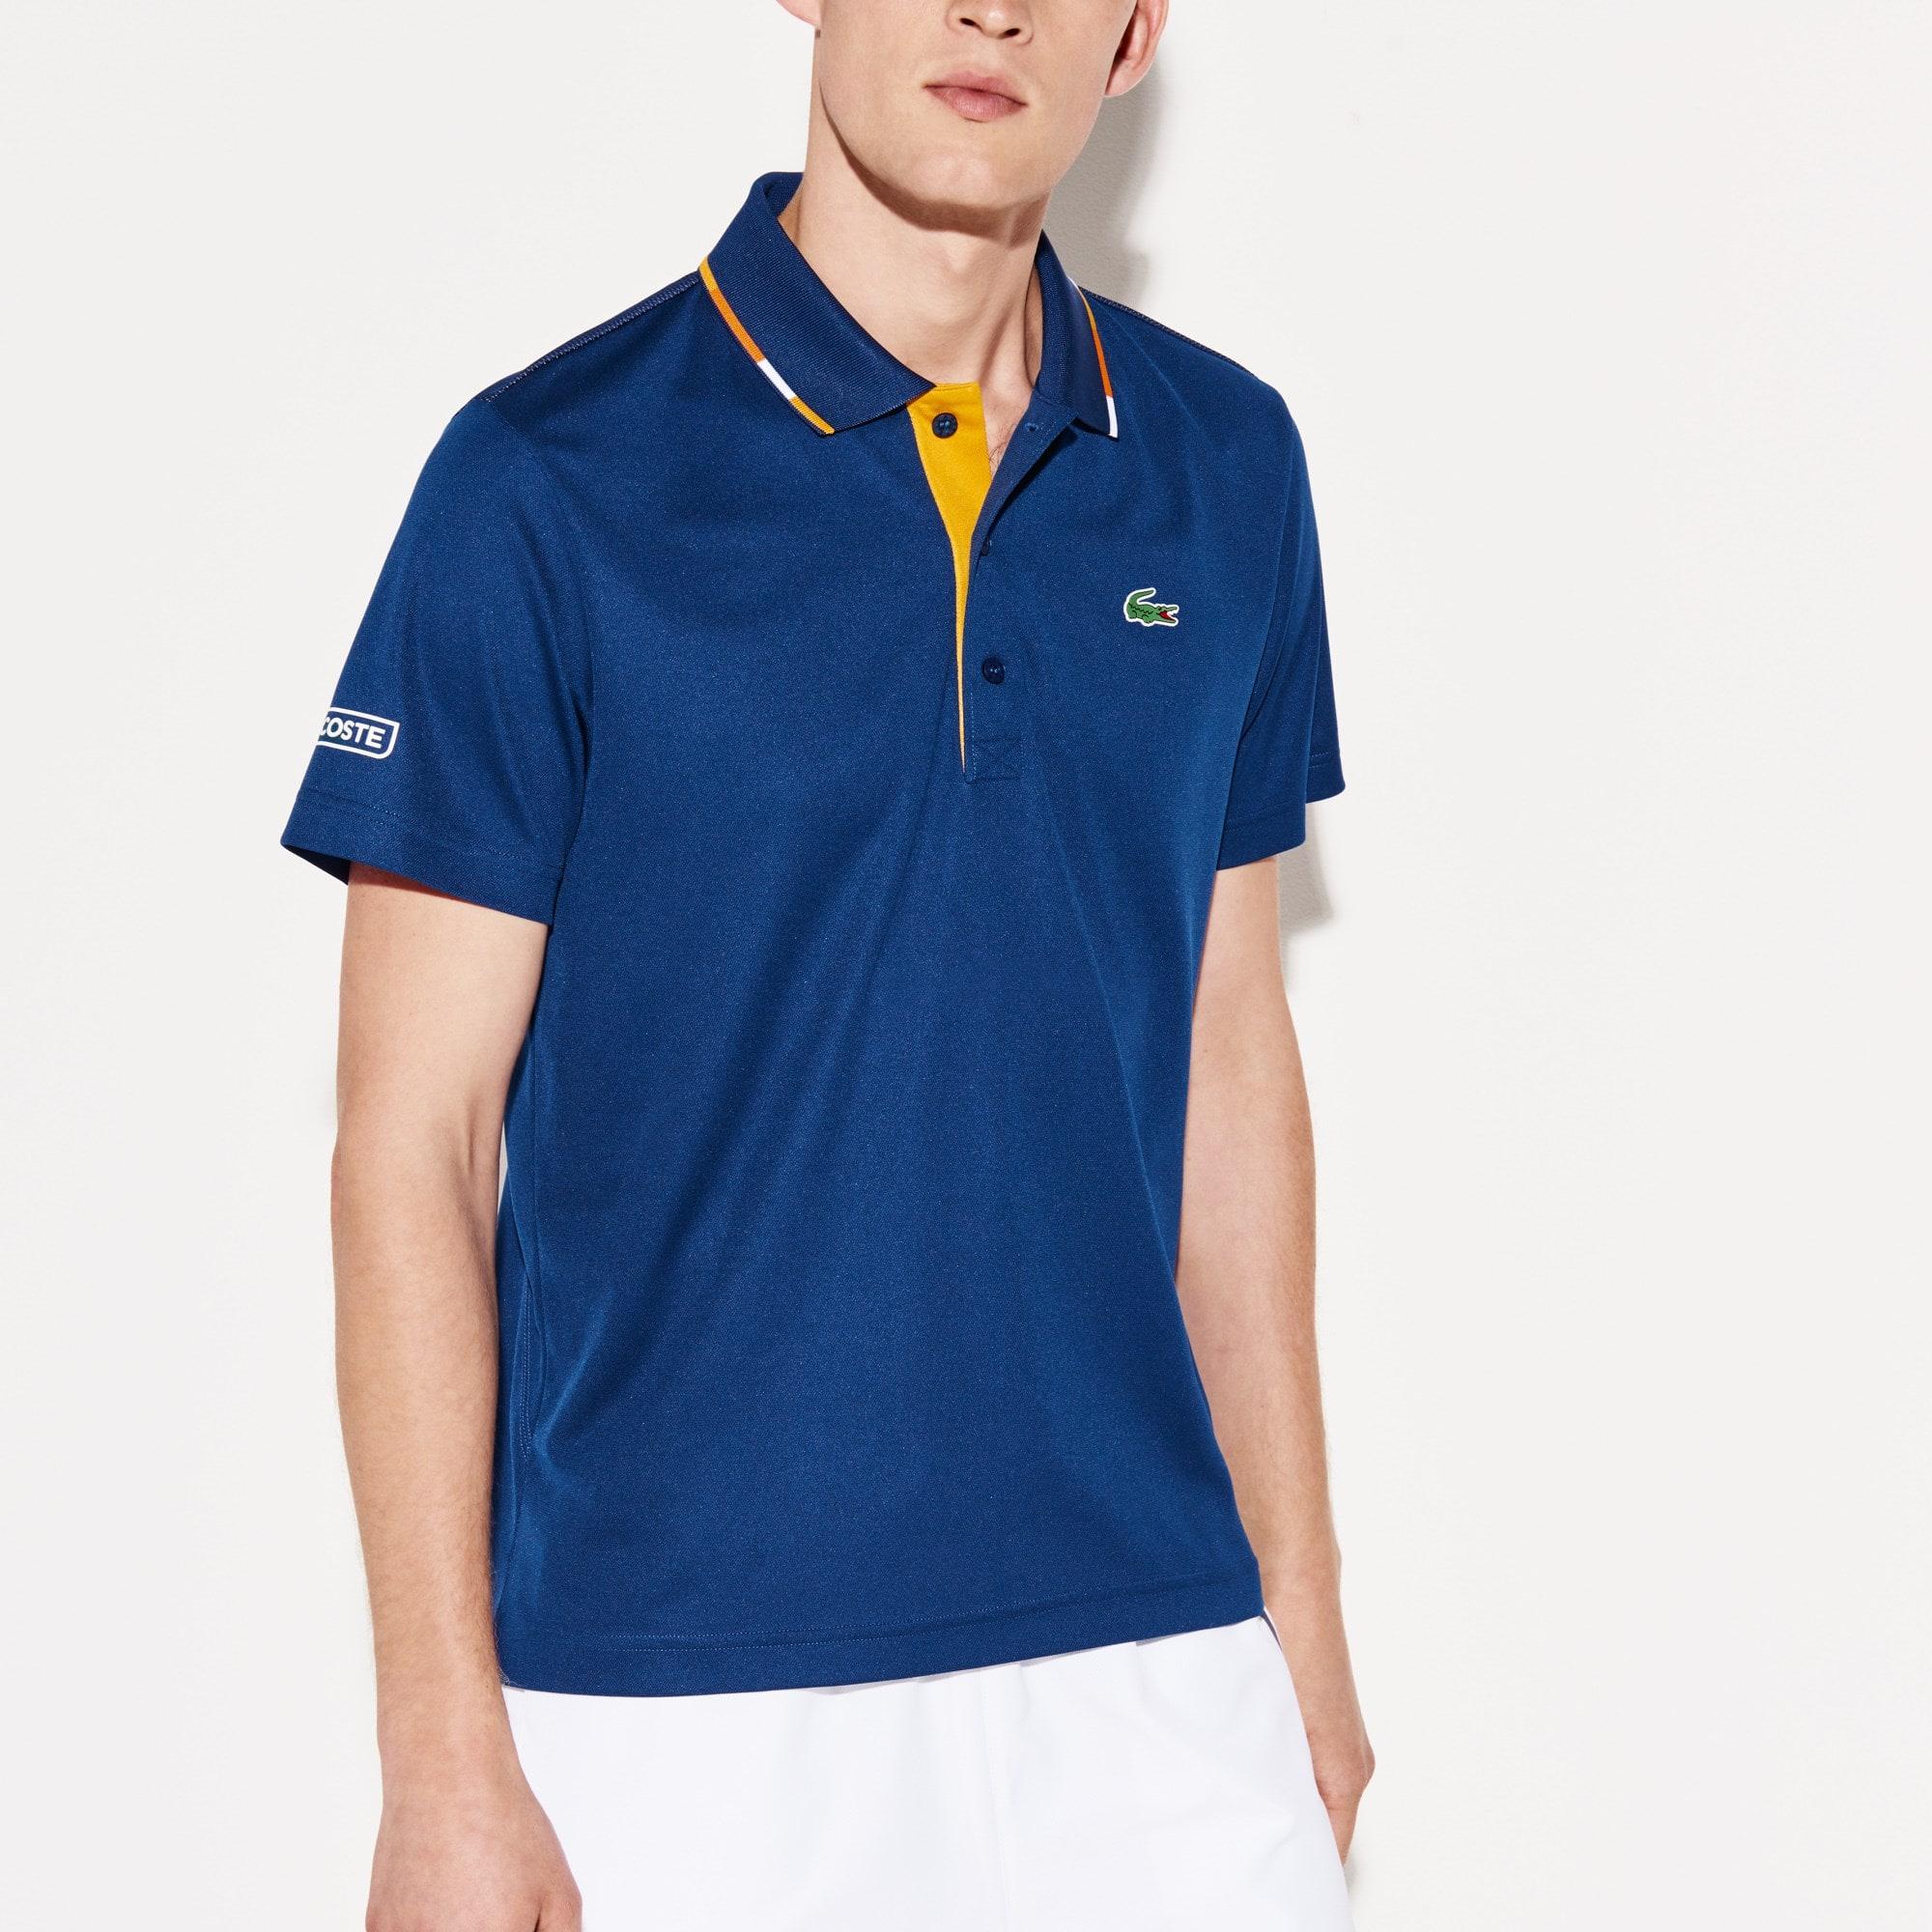 Polo Tennis Lacoste SPORT in piqué tecnico con bordino